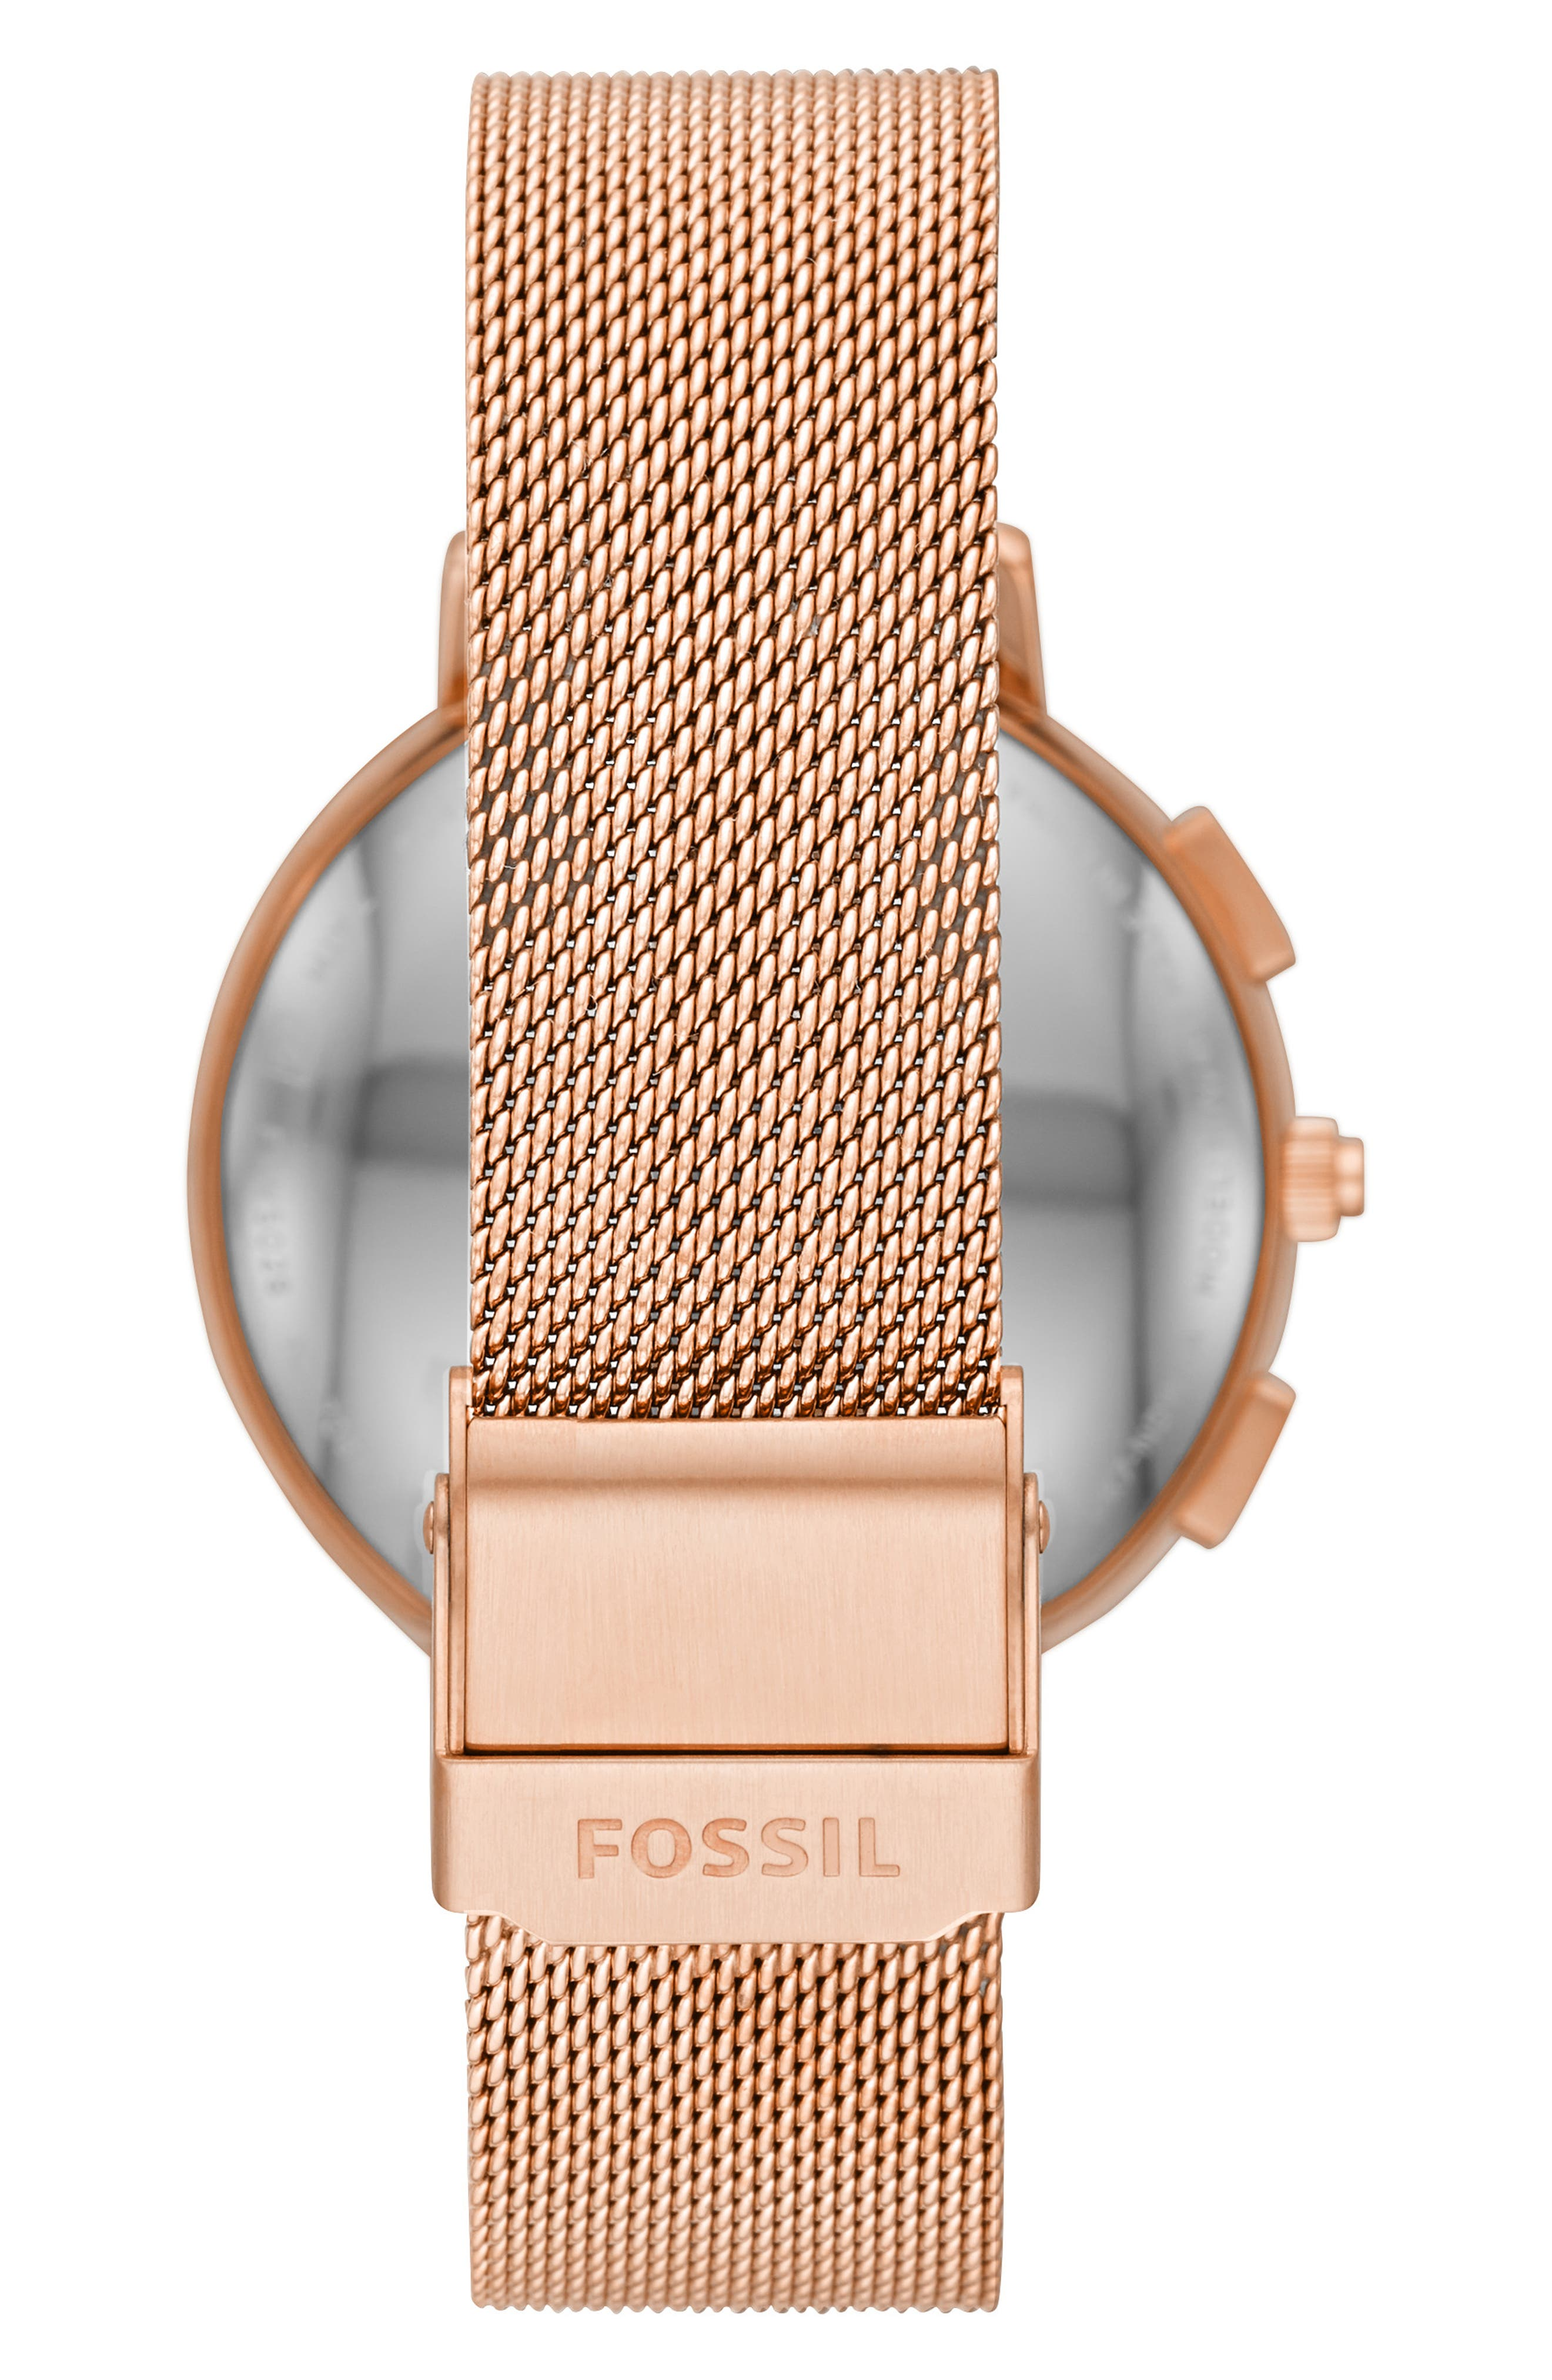 FOSSIL Q,                             Harper Smart Watch, 37mm,                             Alternate thumbnail 2, color,                             710